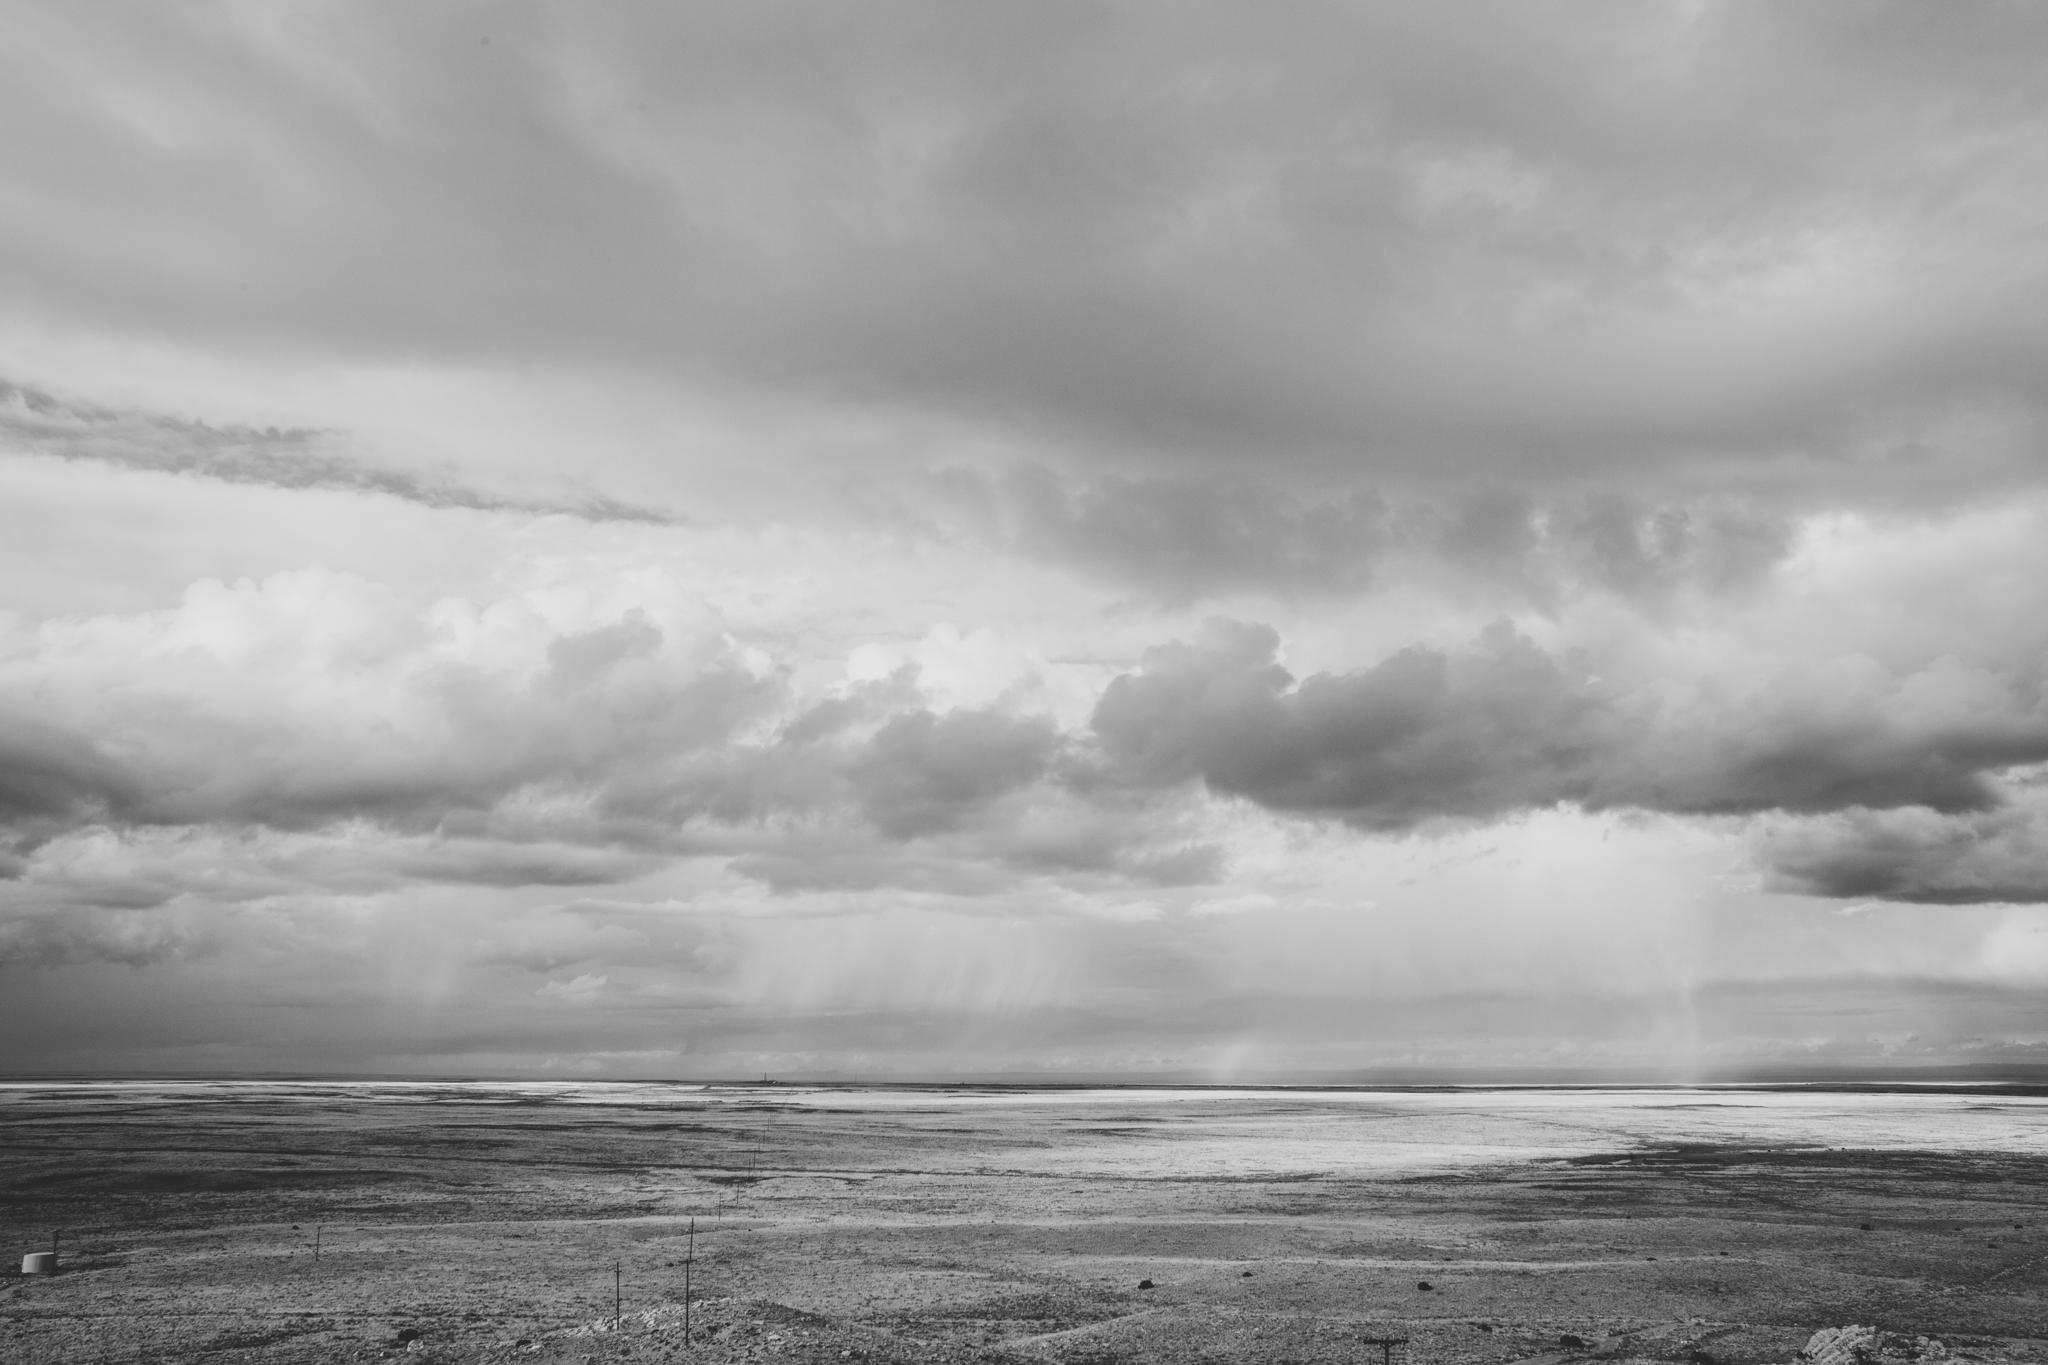 desert storm on the horizon black and white arizona